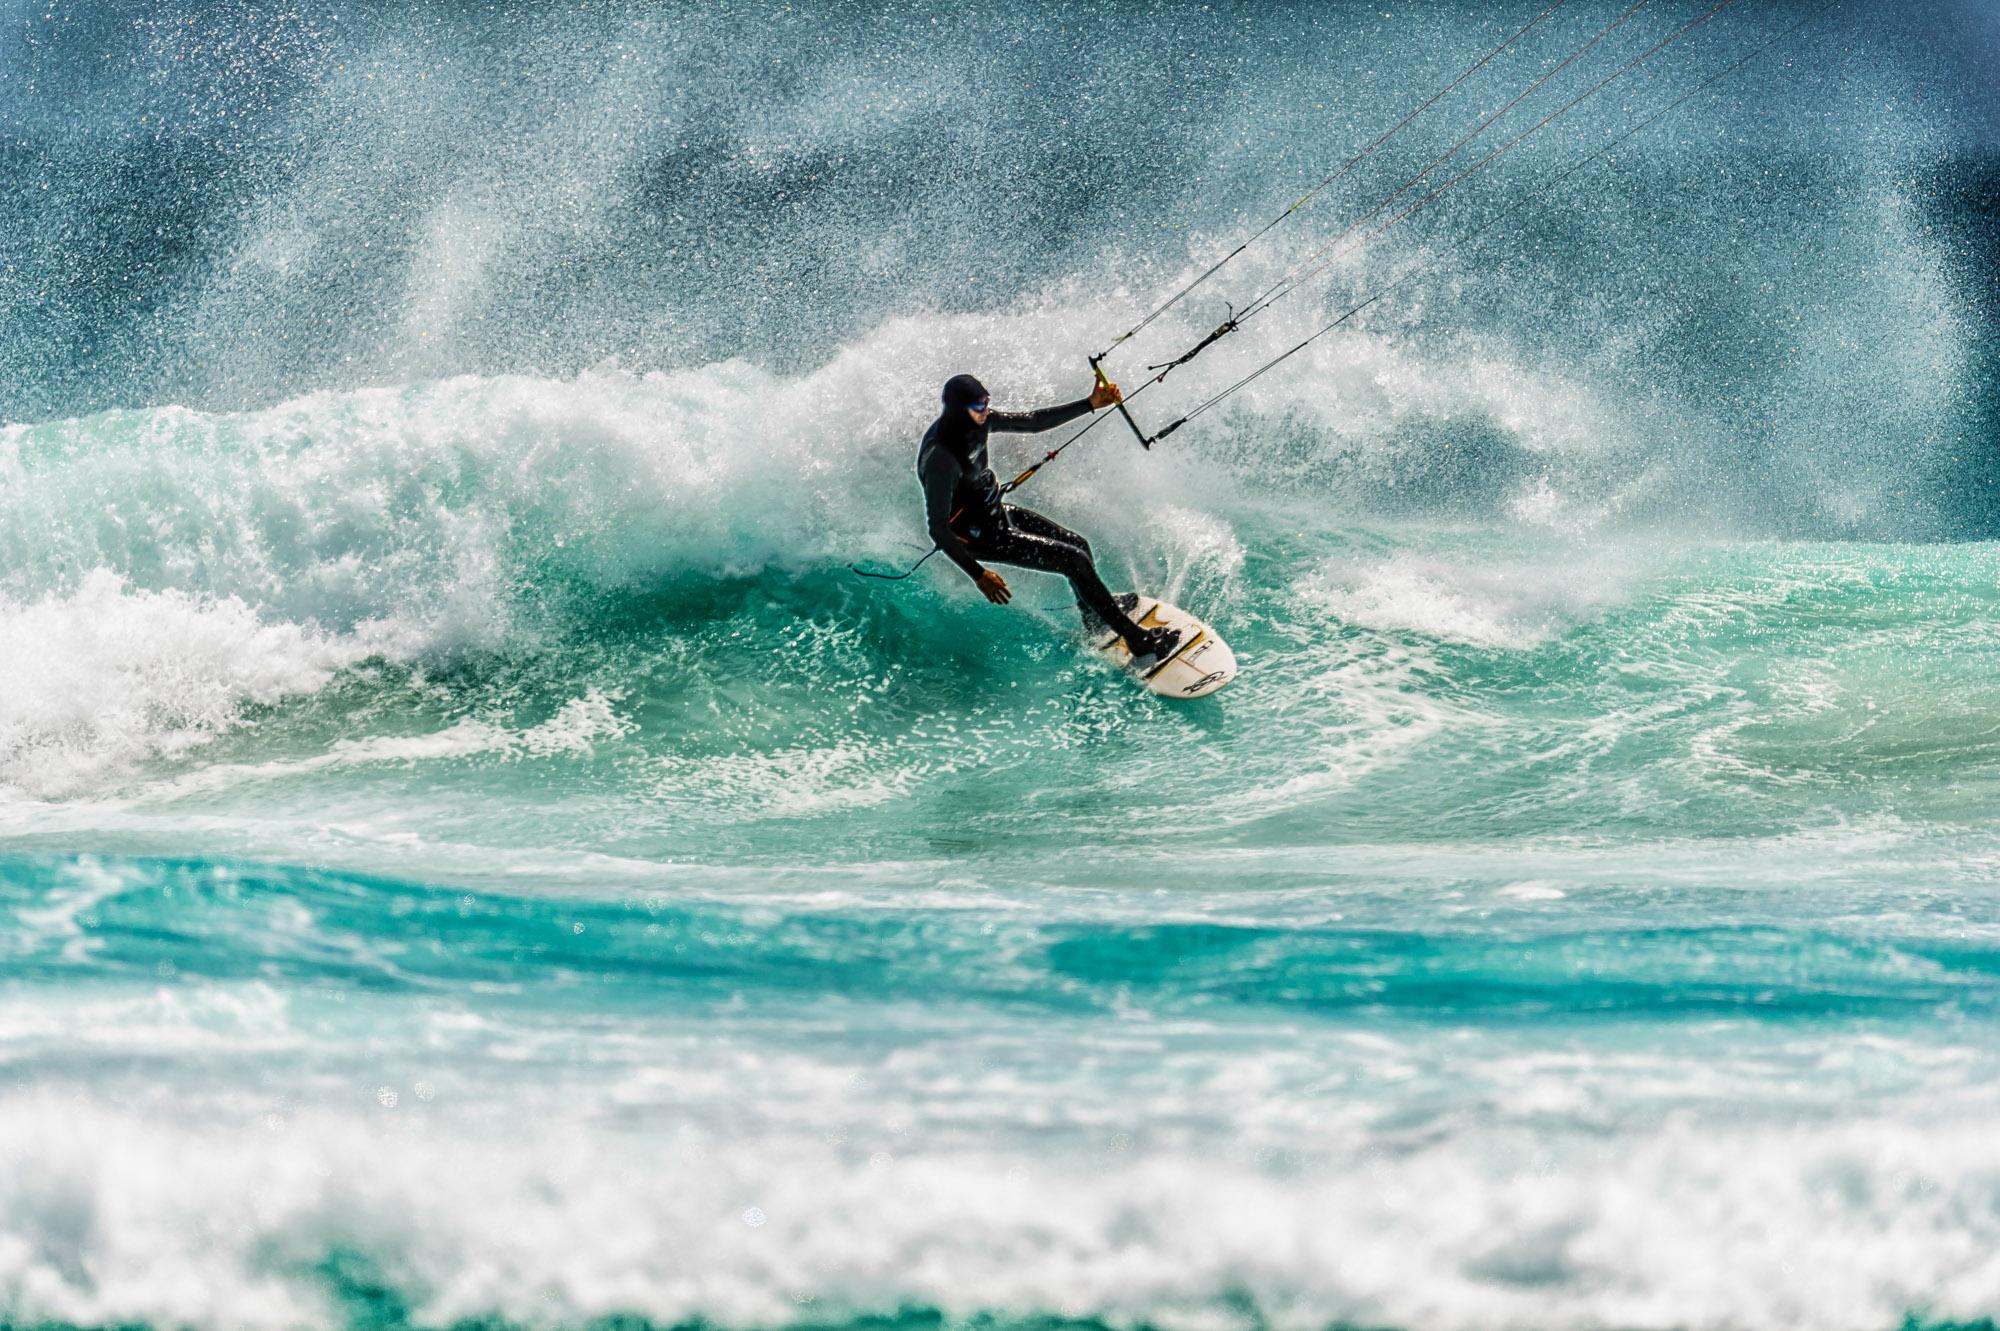 Extreme Kite Surfing